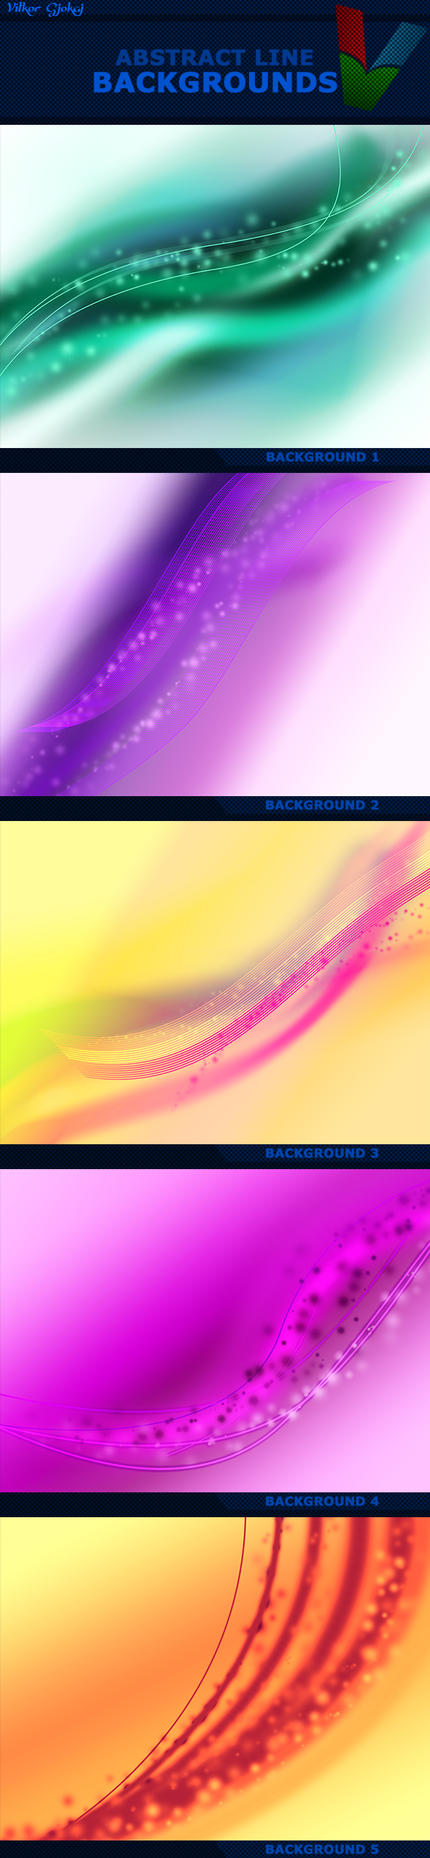 Abstract Line Backgrounds by ViktorGjokaj